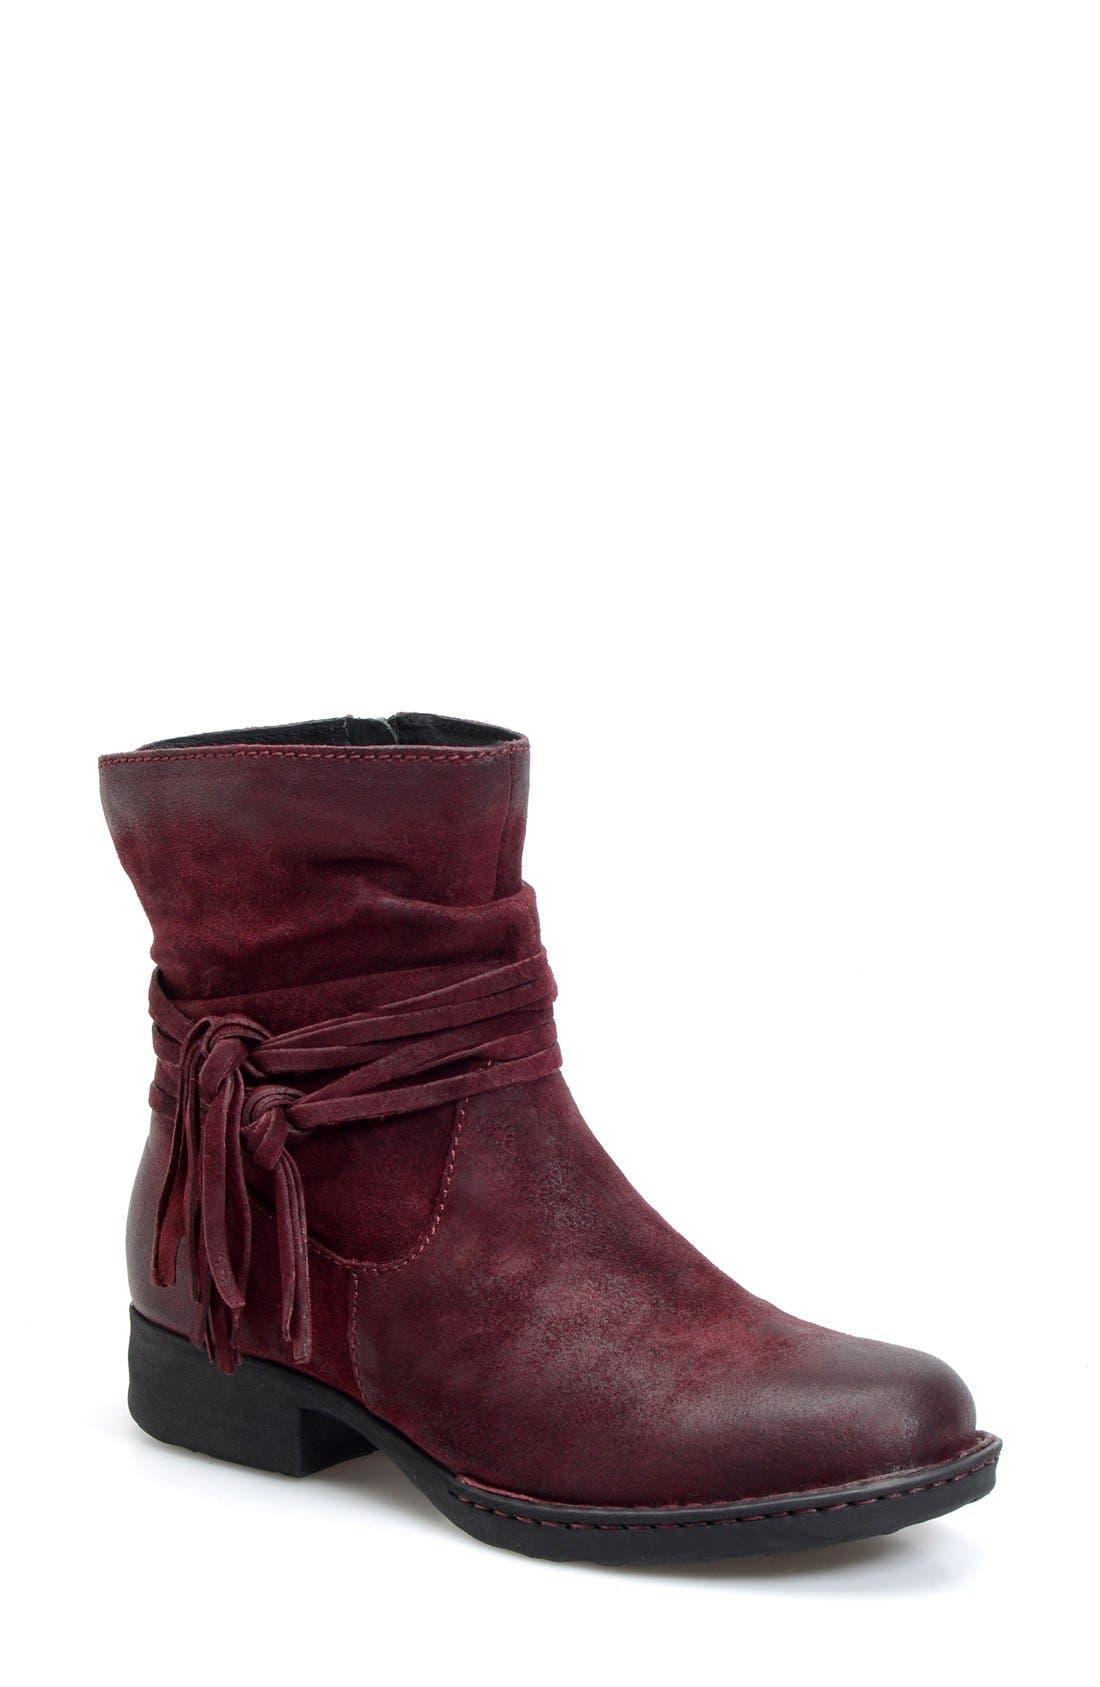 'Cross' Bootie,                         Main,                         color, Amarena Distressed Leather